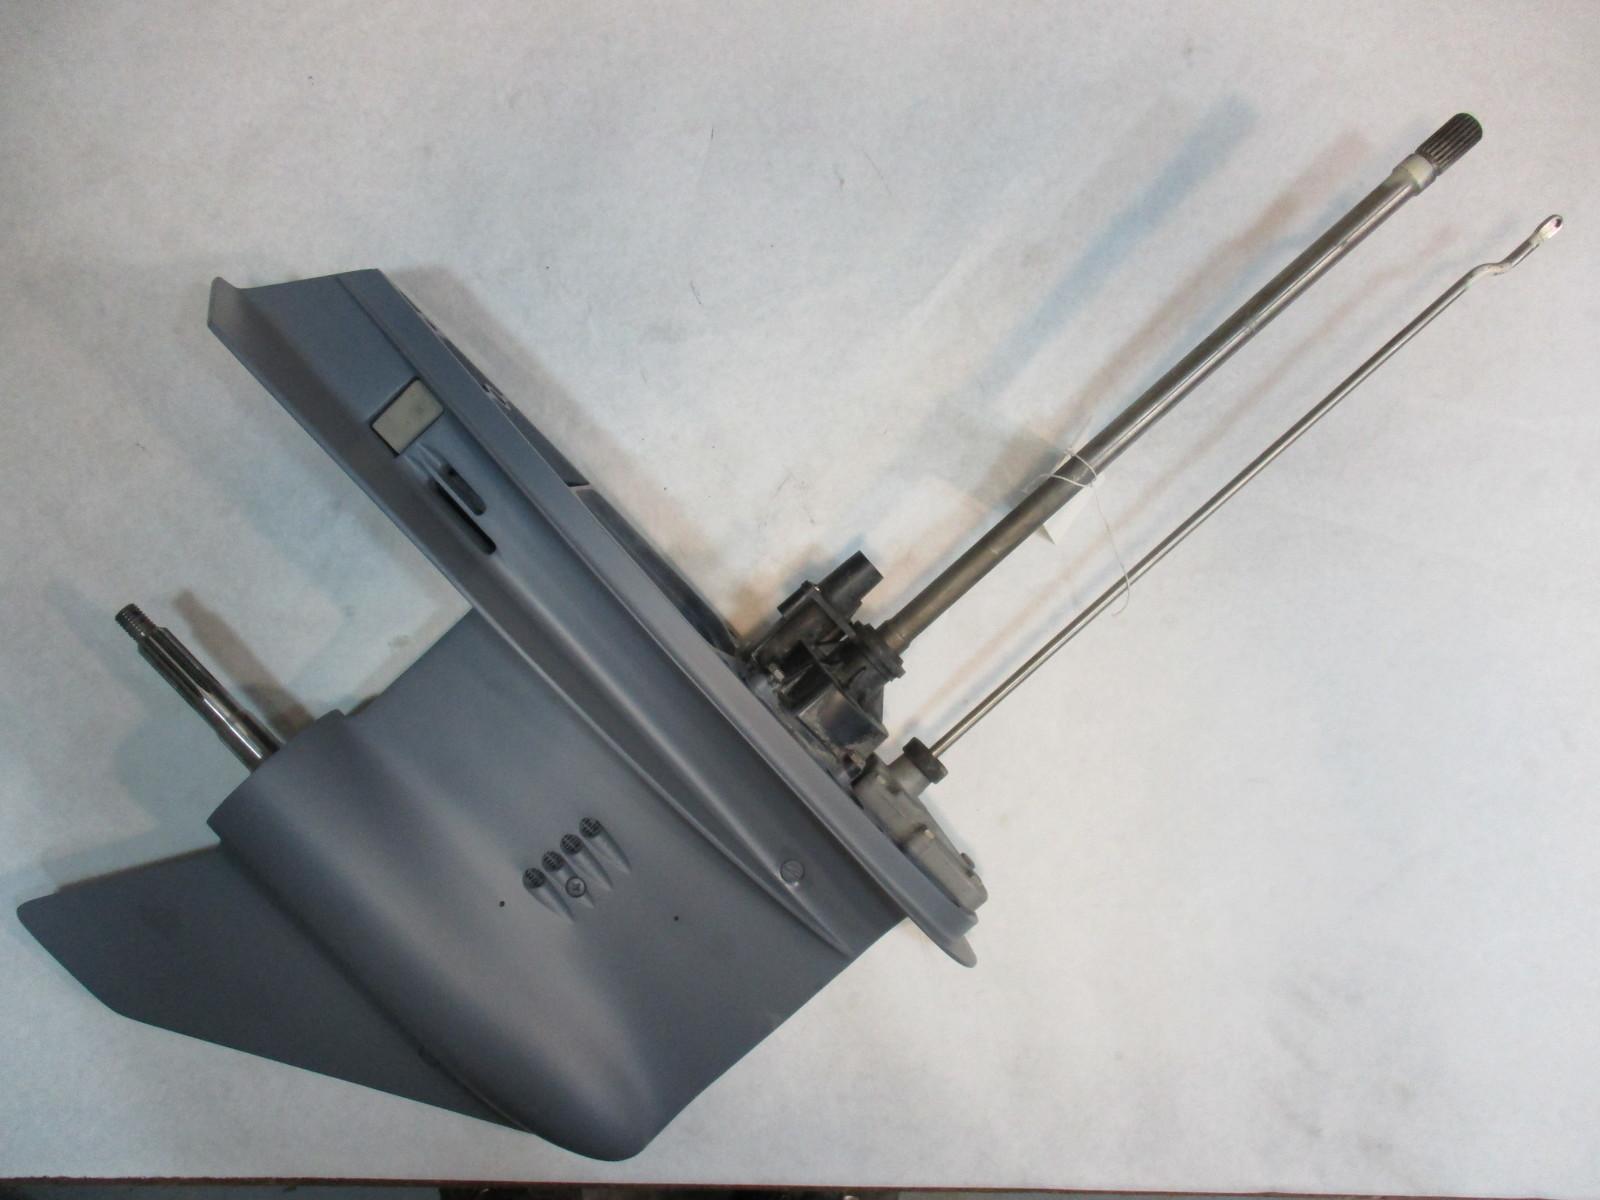 1999 Johnson 115 Outboard Specs Pdf